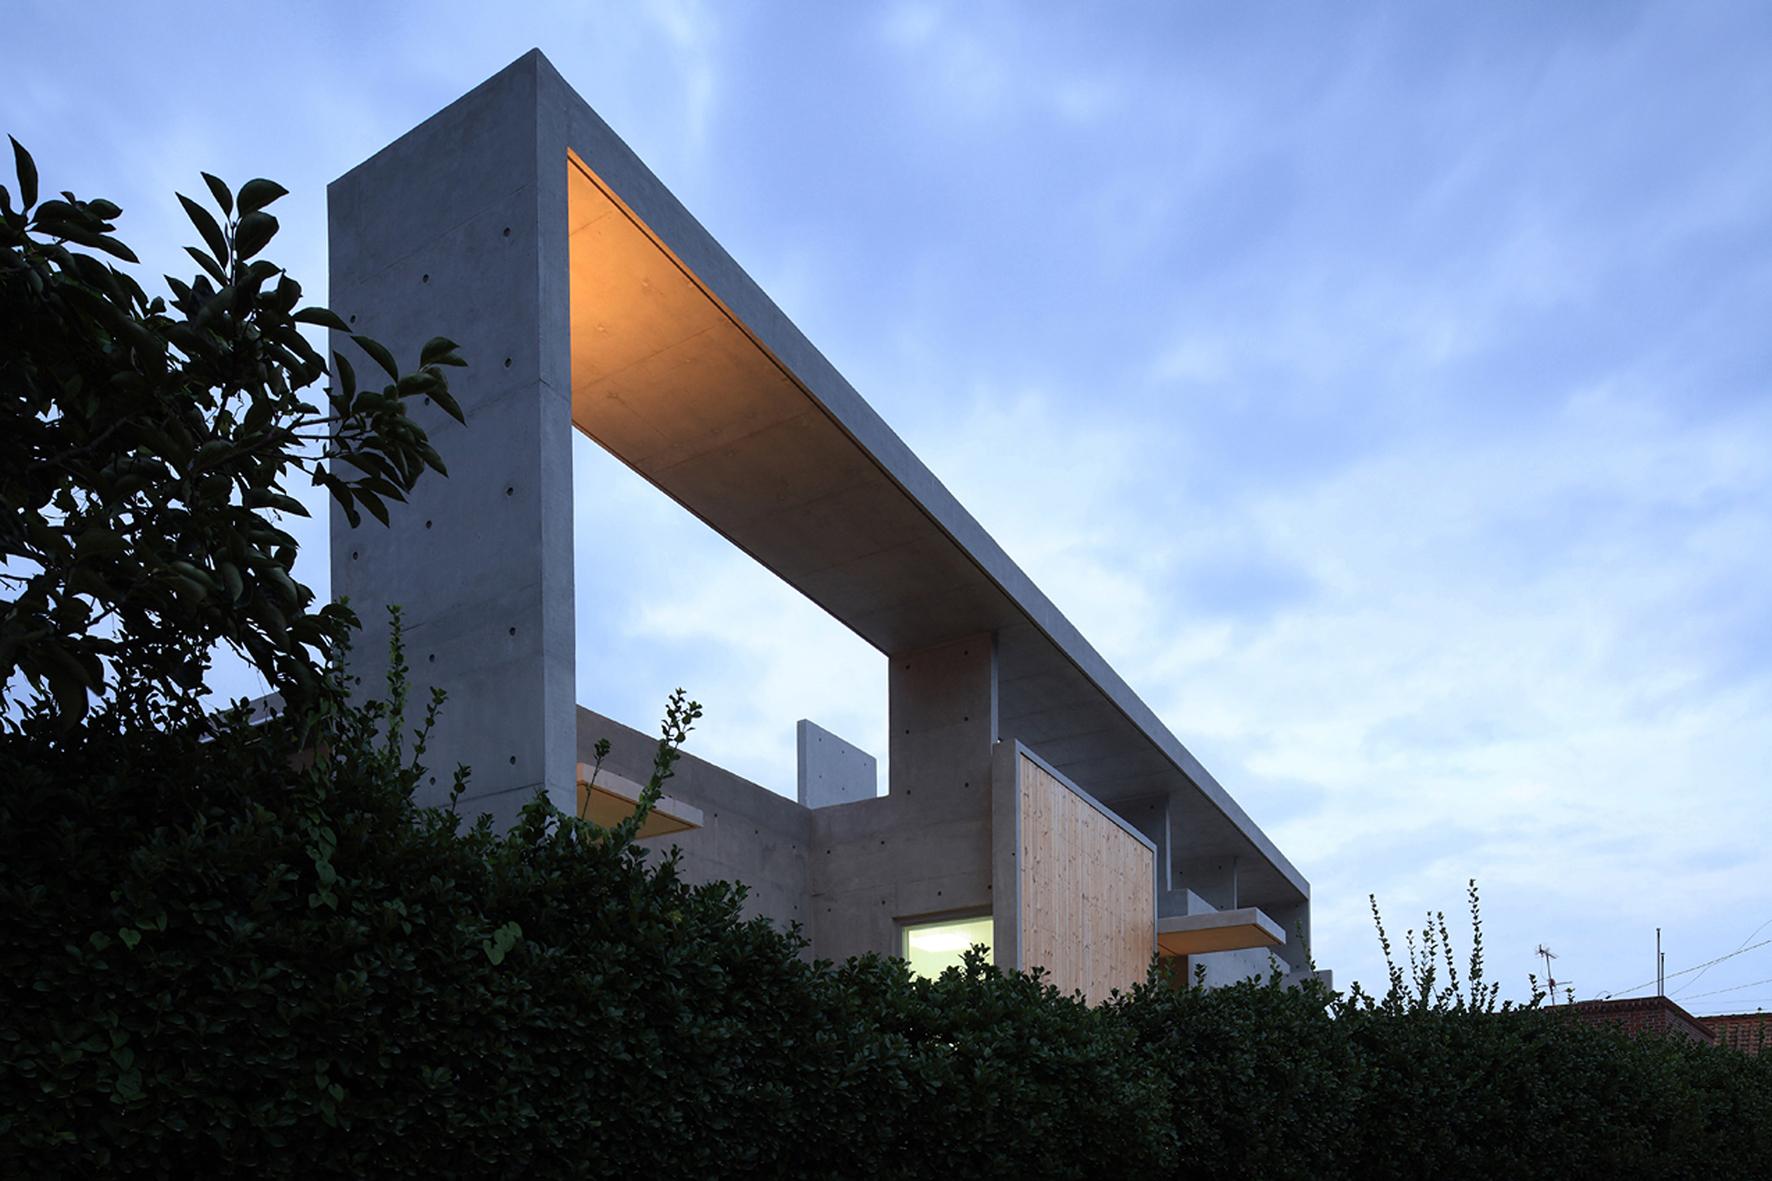 52f1a5c8e8e44e61110000c0_mun-jeong-heon-a-m-architects_a3